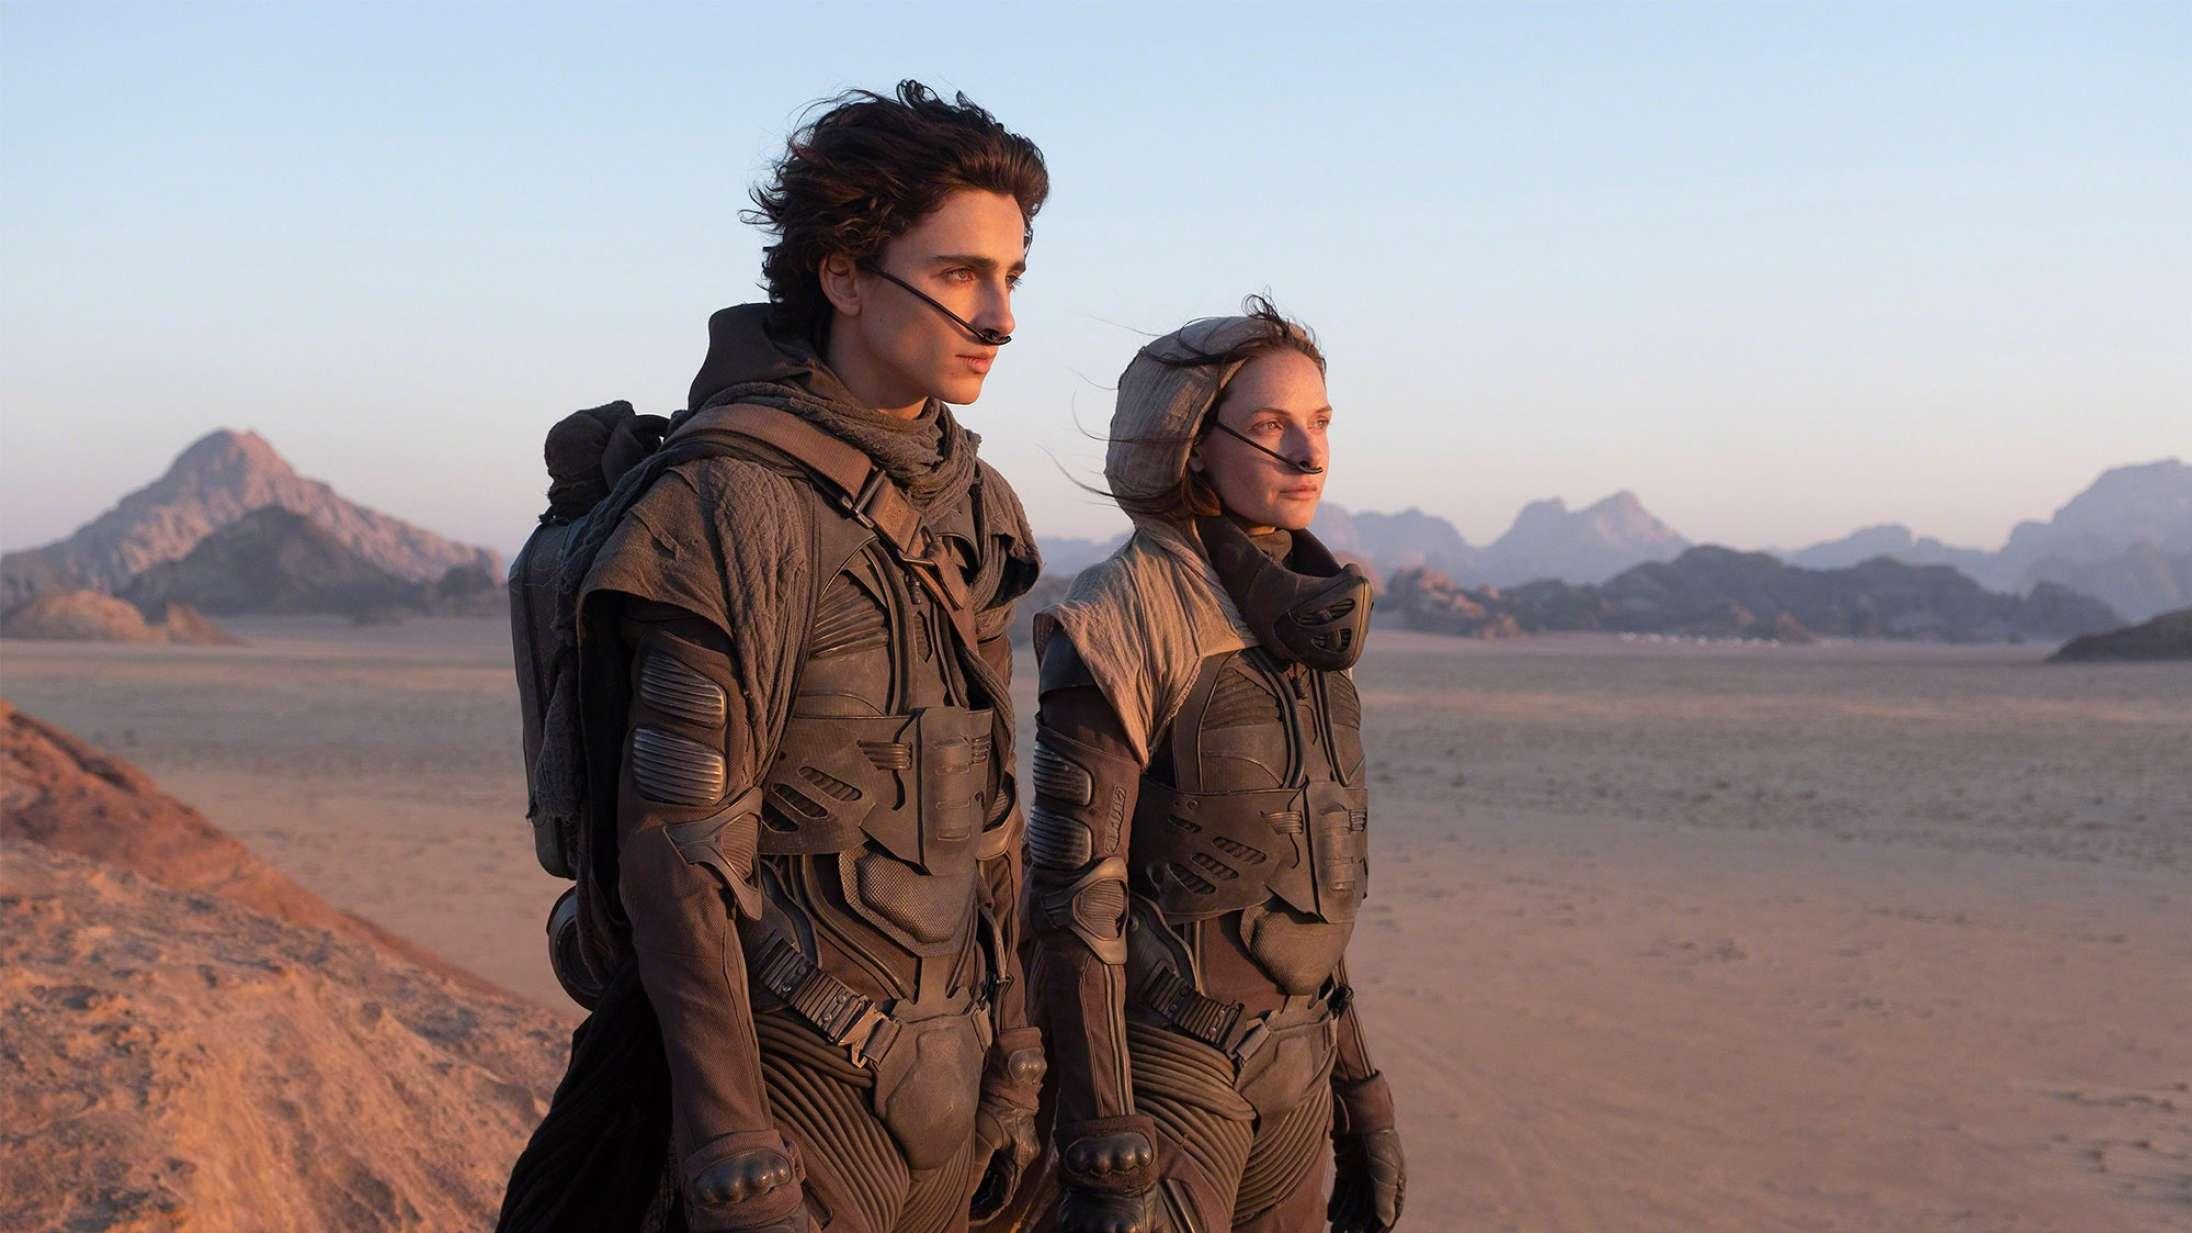 En bombe under filmverdenen: Warner sender kæmpefilm som 'Dune' og 'Matrix 4' til streaming og bio samtidig